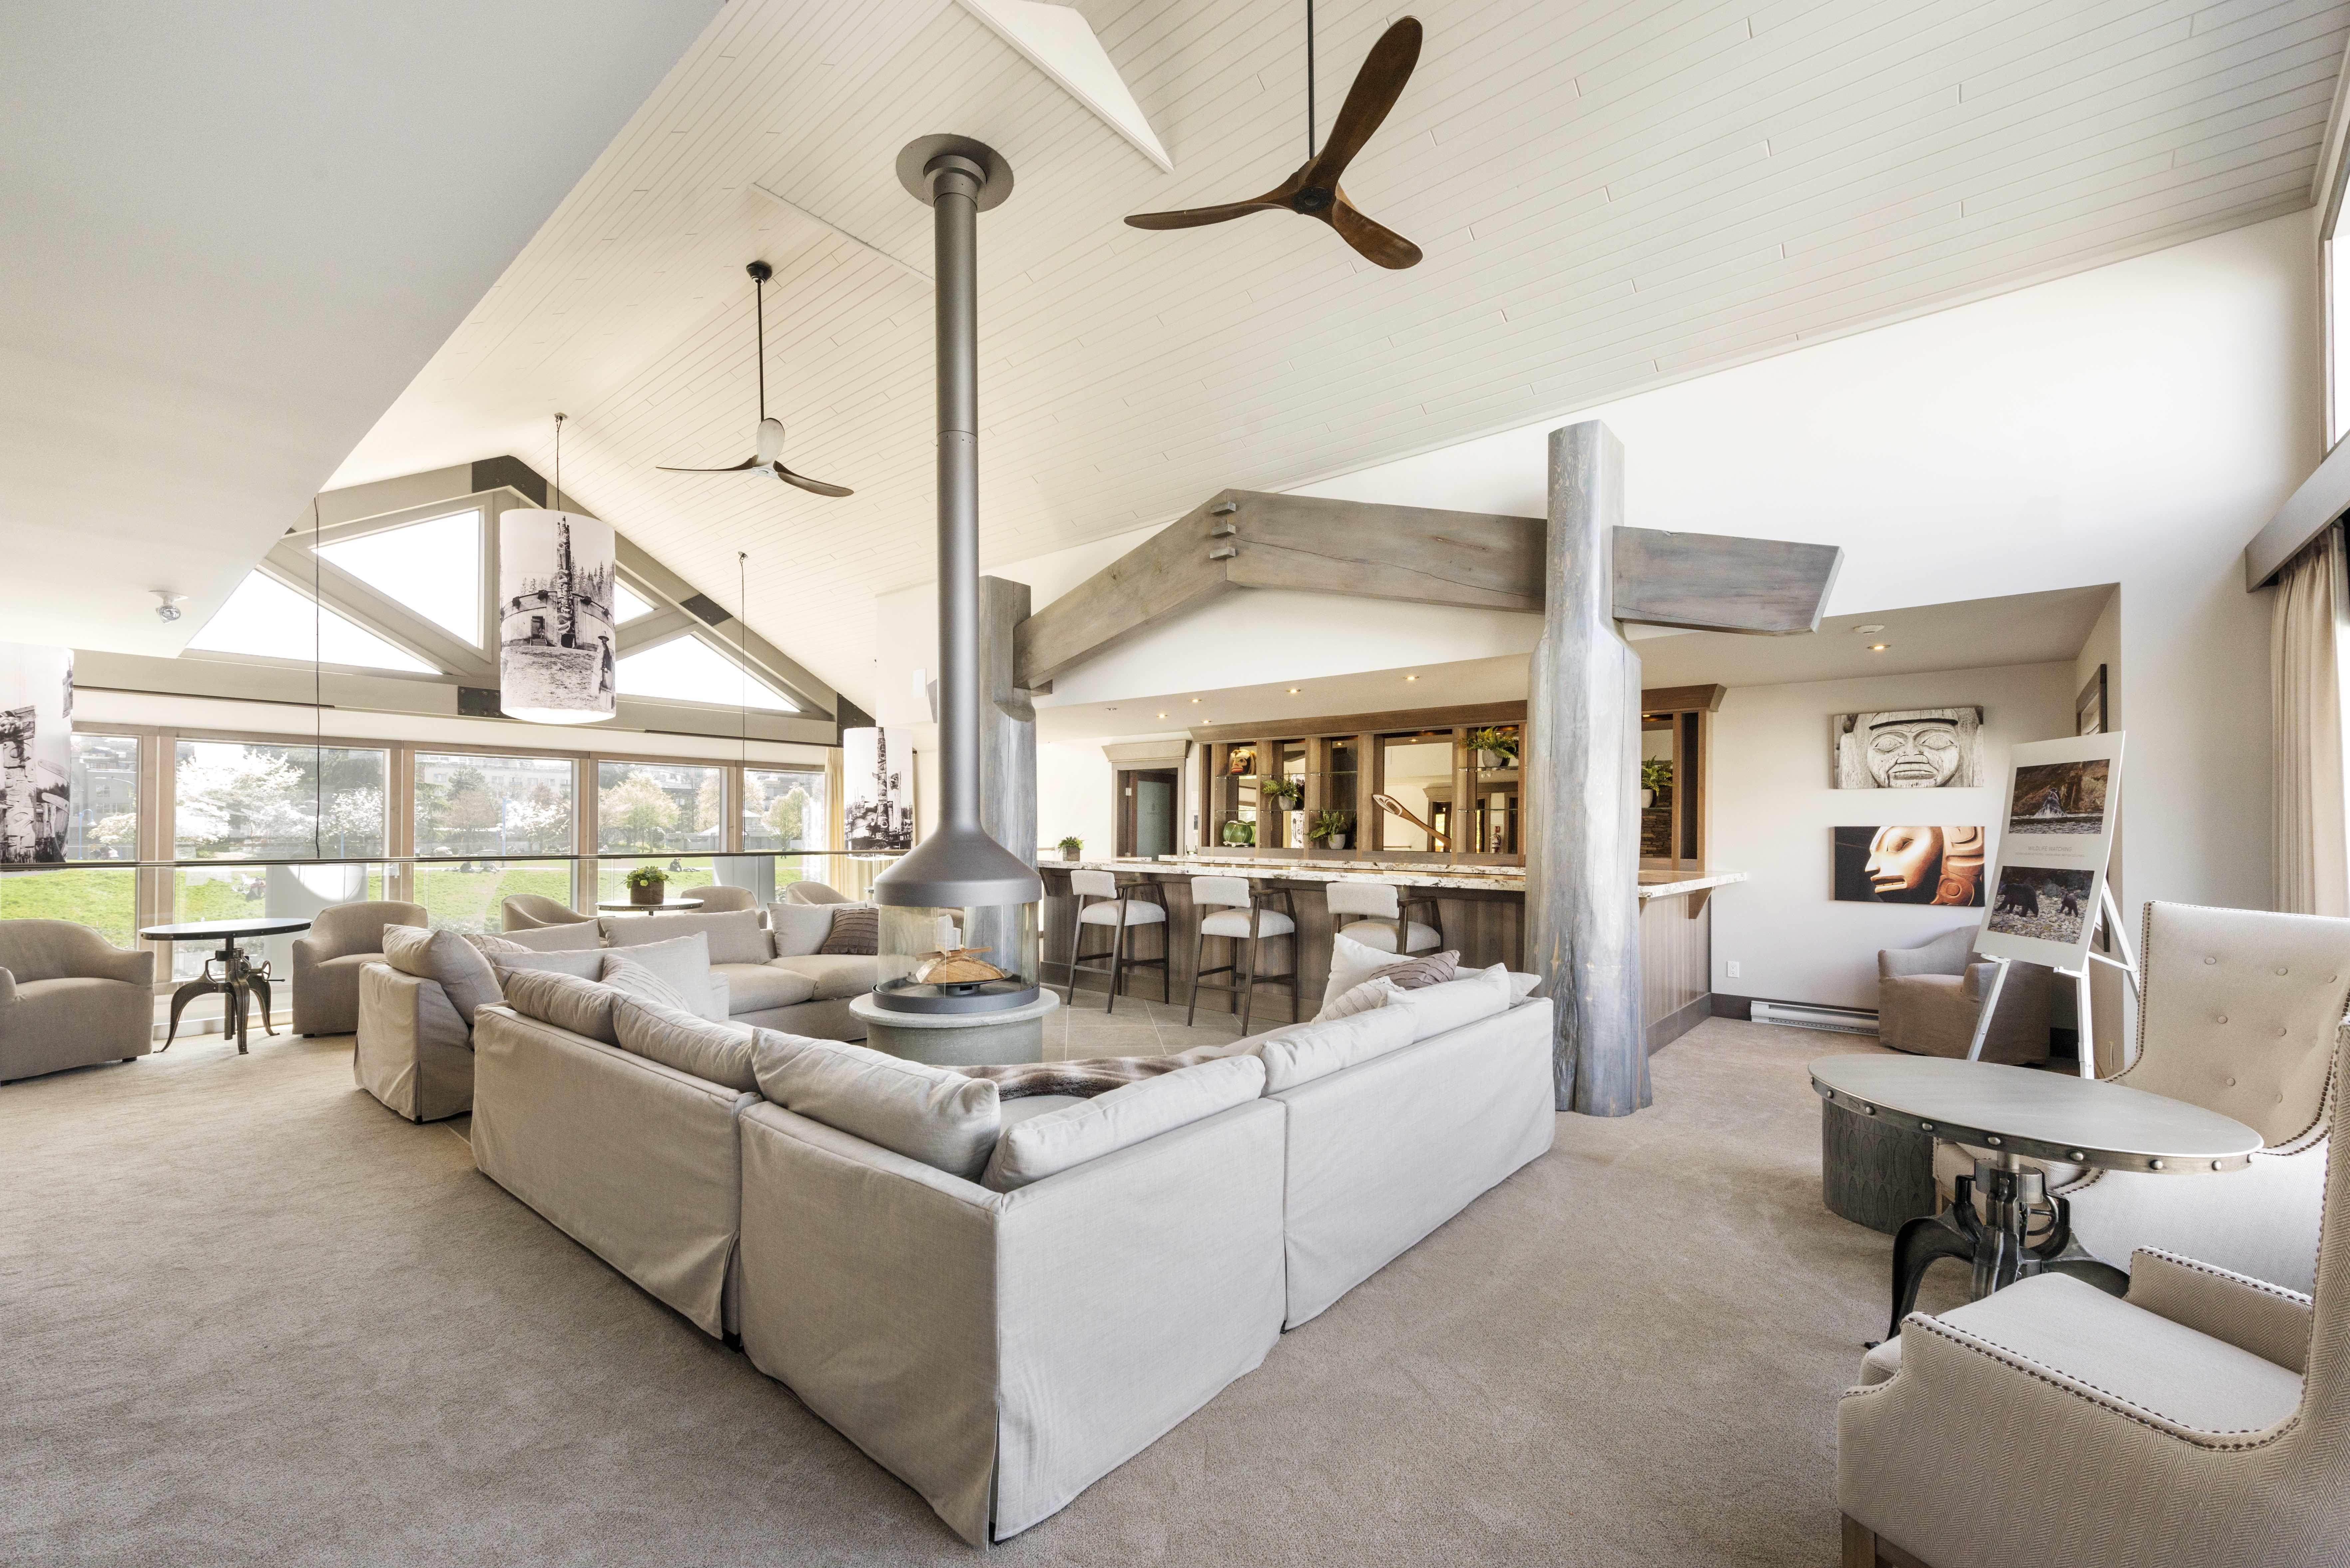 Living Area /Myshsael Schlyecher